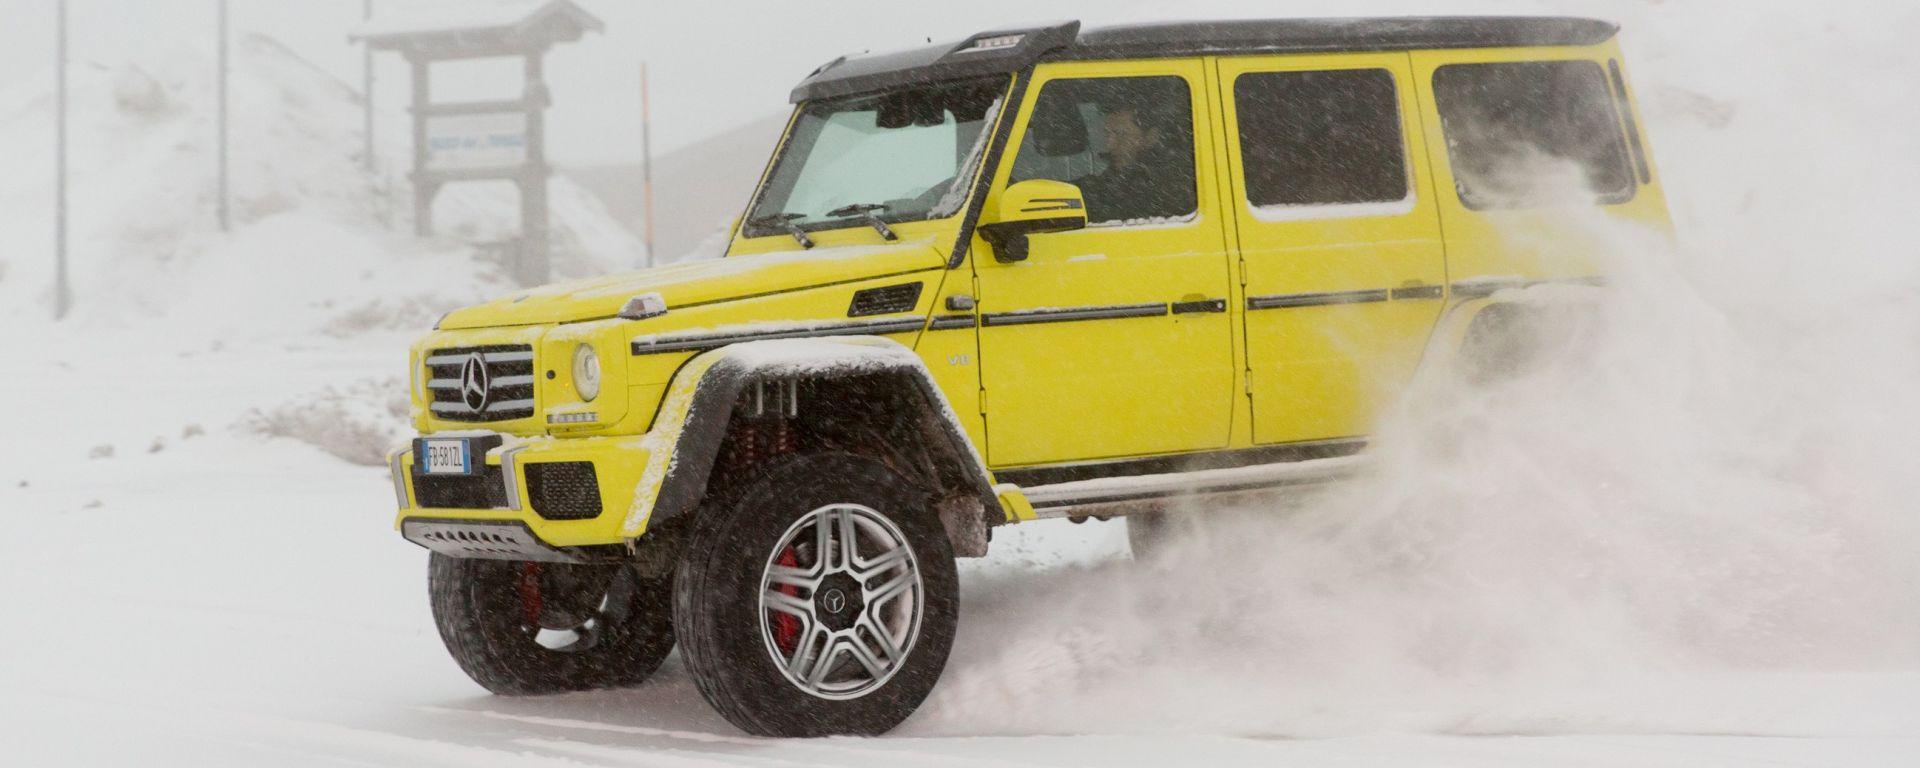 Mercedes G 500 4x4²: alla guida di un monster truck